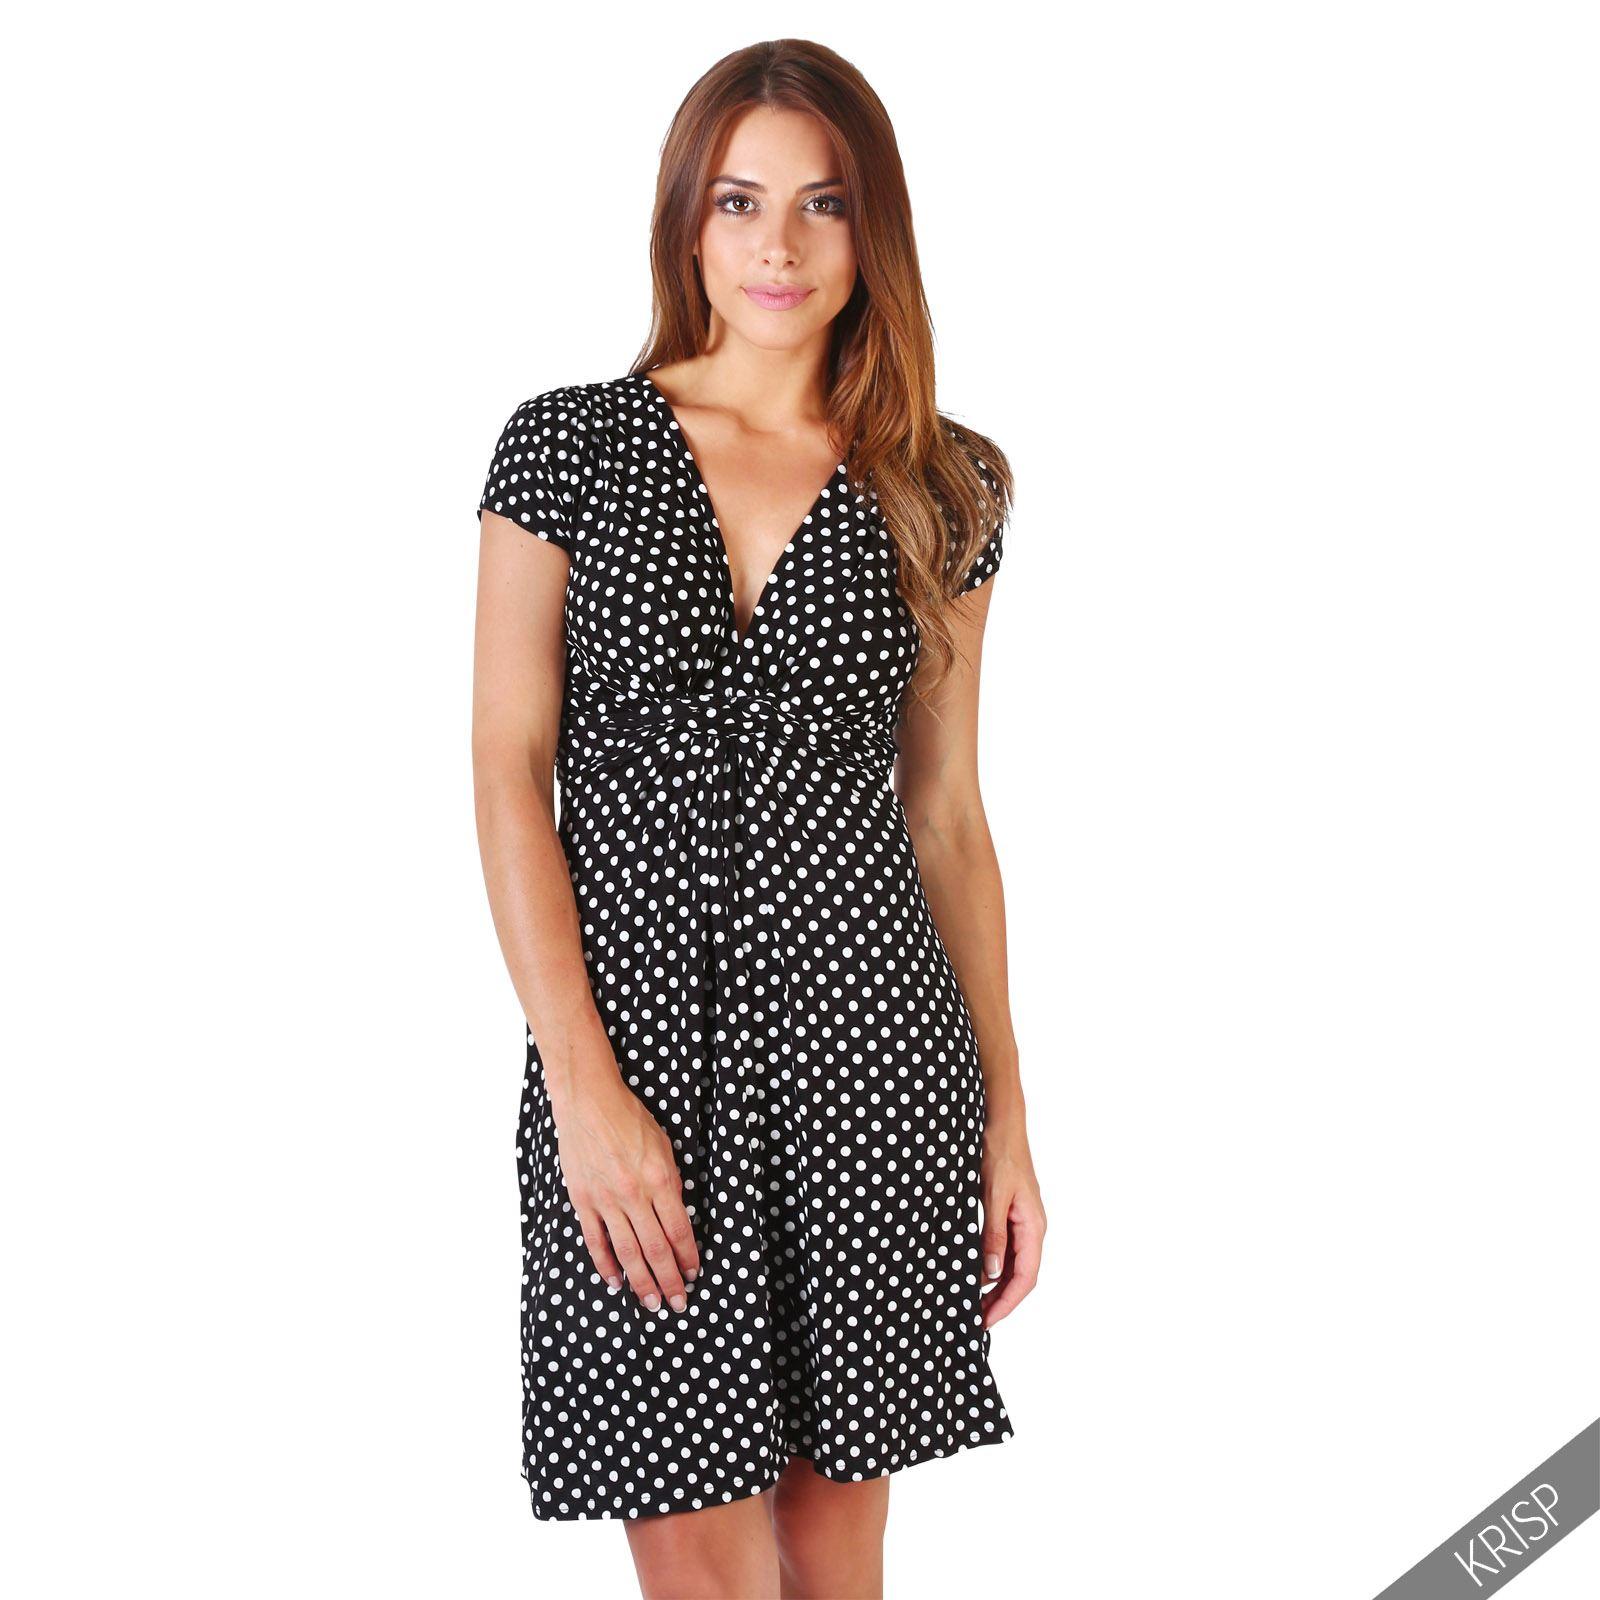 Womens-Polka-Dot-Swing-Dress-Midi-Gathered-Waist-V-Neck-3-4-Sleeve-Wrap-AU